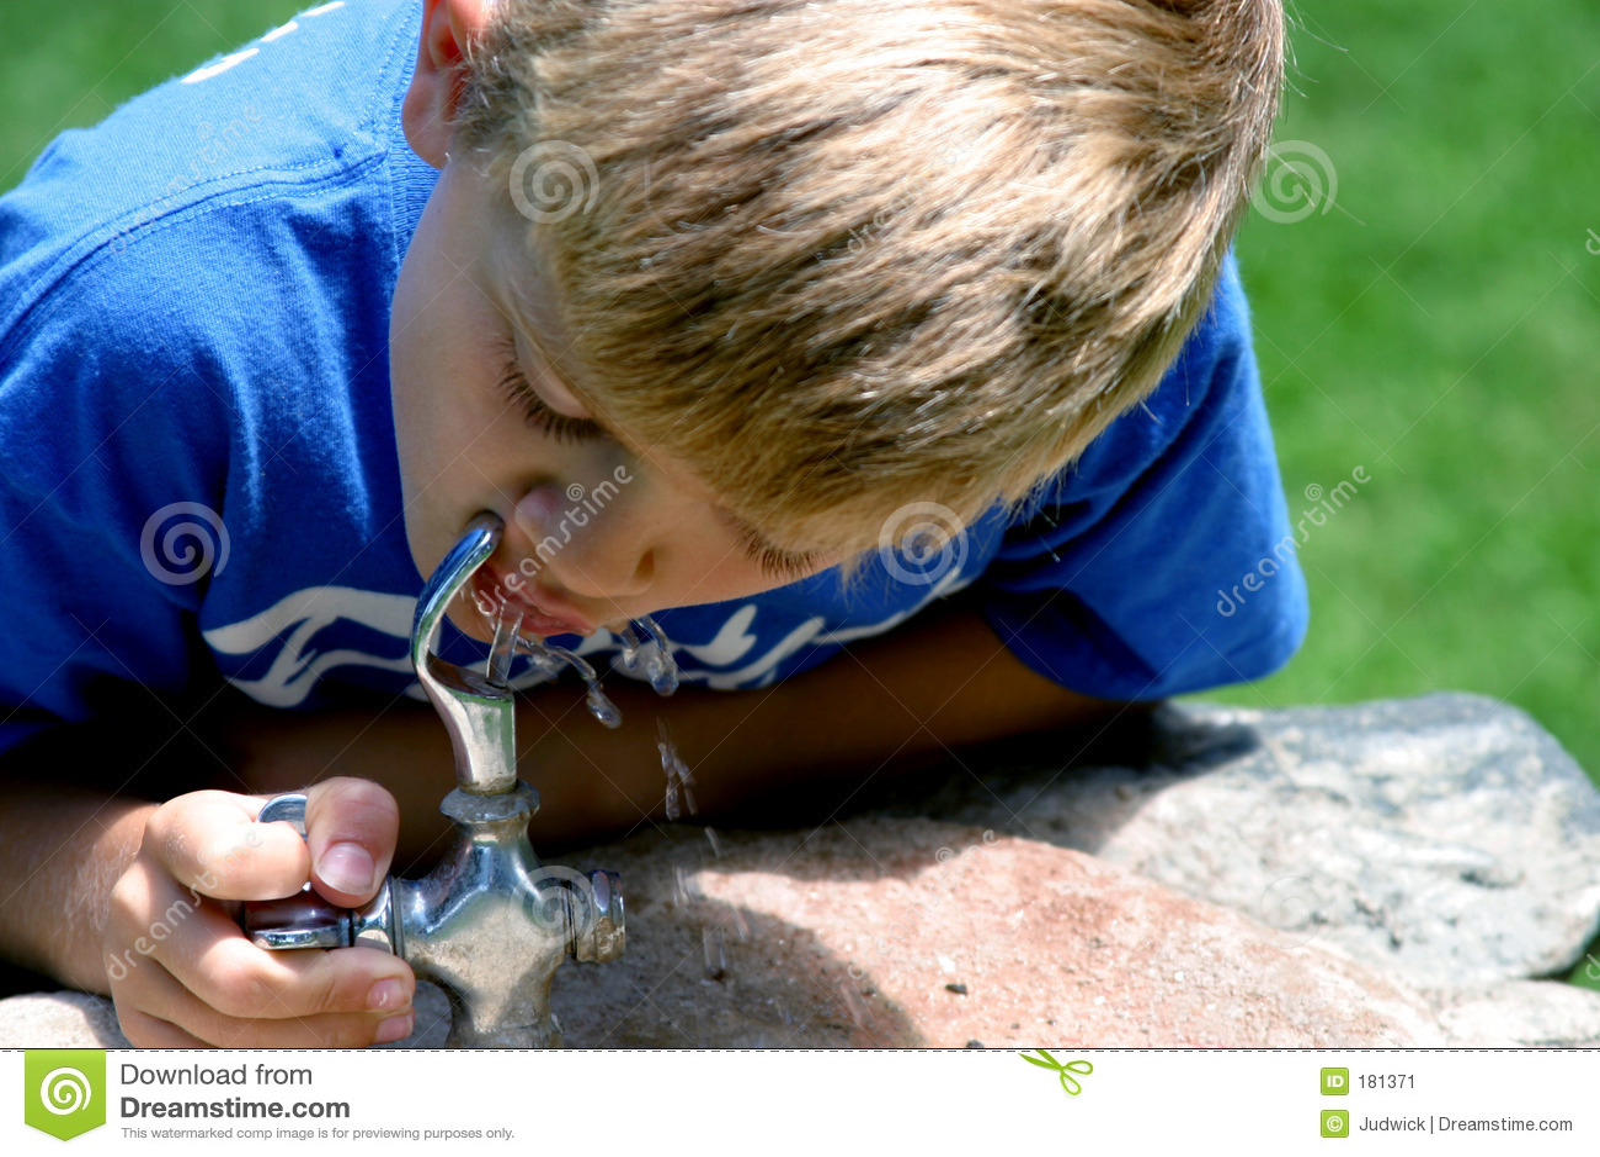 Drank van Water